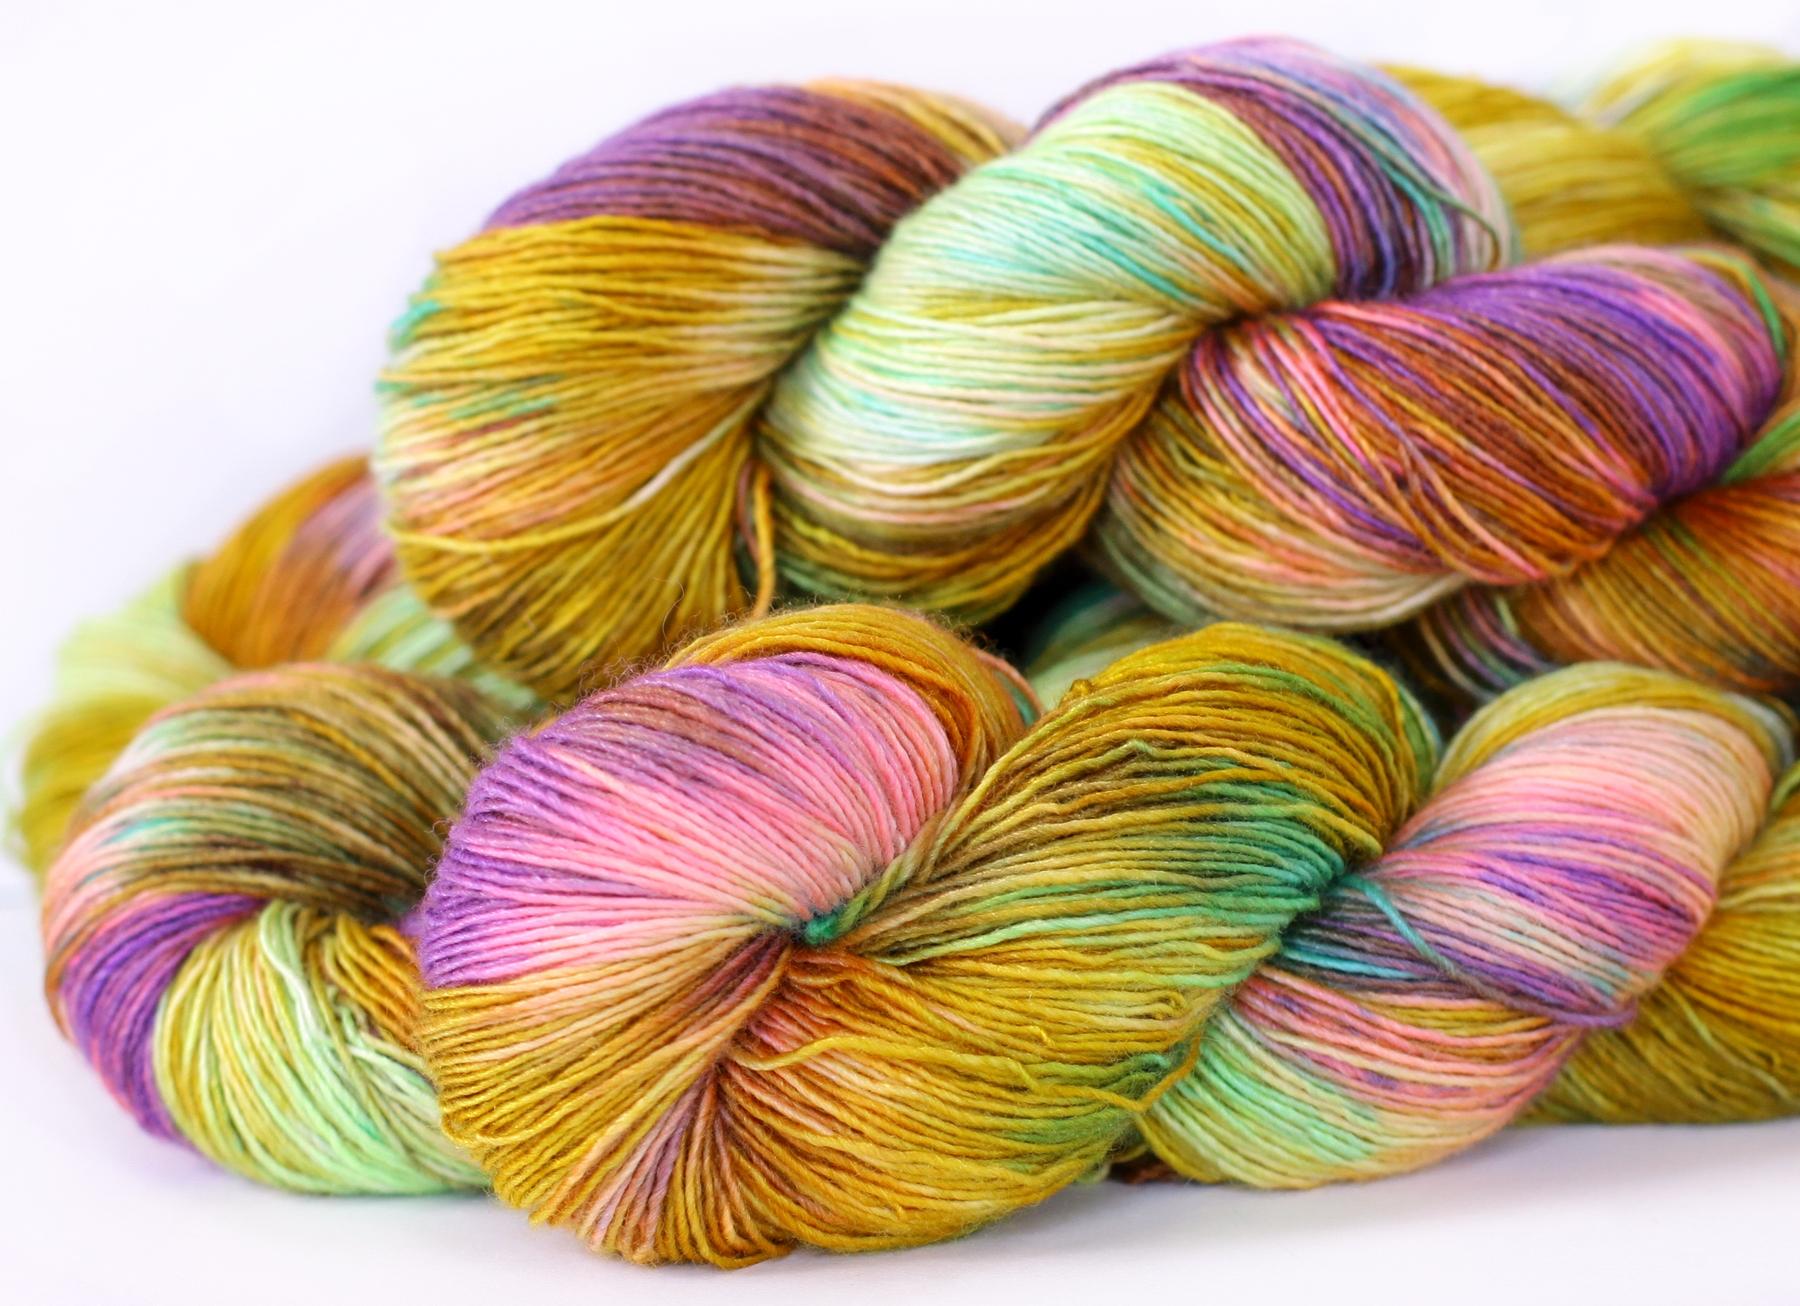 BRONZED BUTTERFLY, on my Lustre Sock yarn base. A high twist merino/silk, 438 yards.